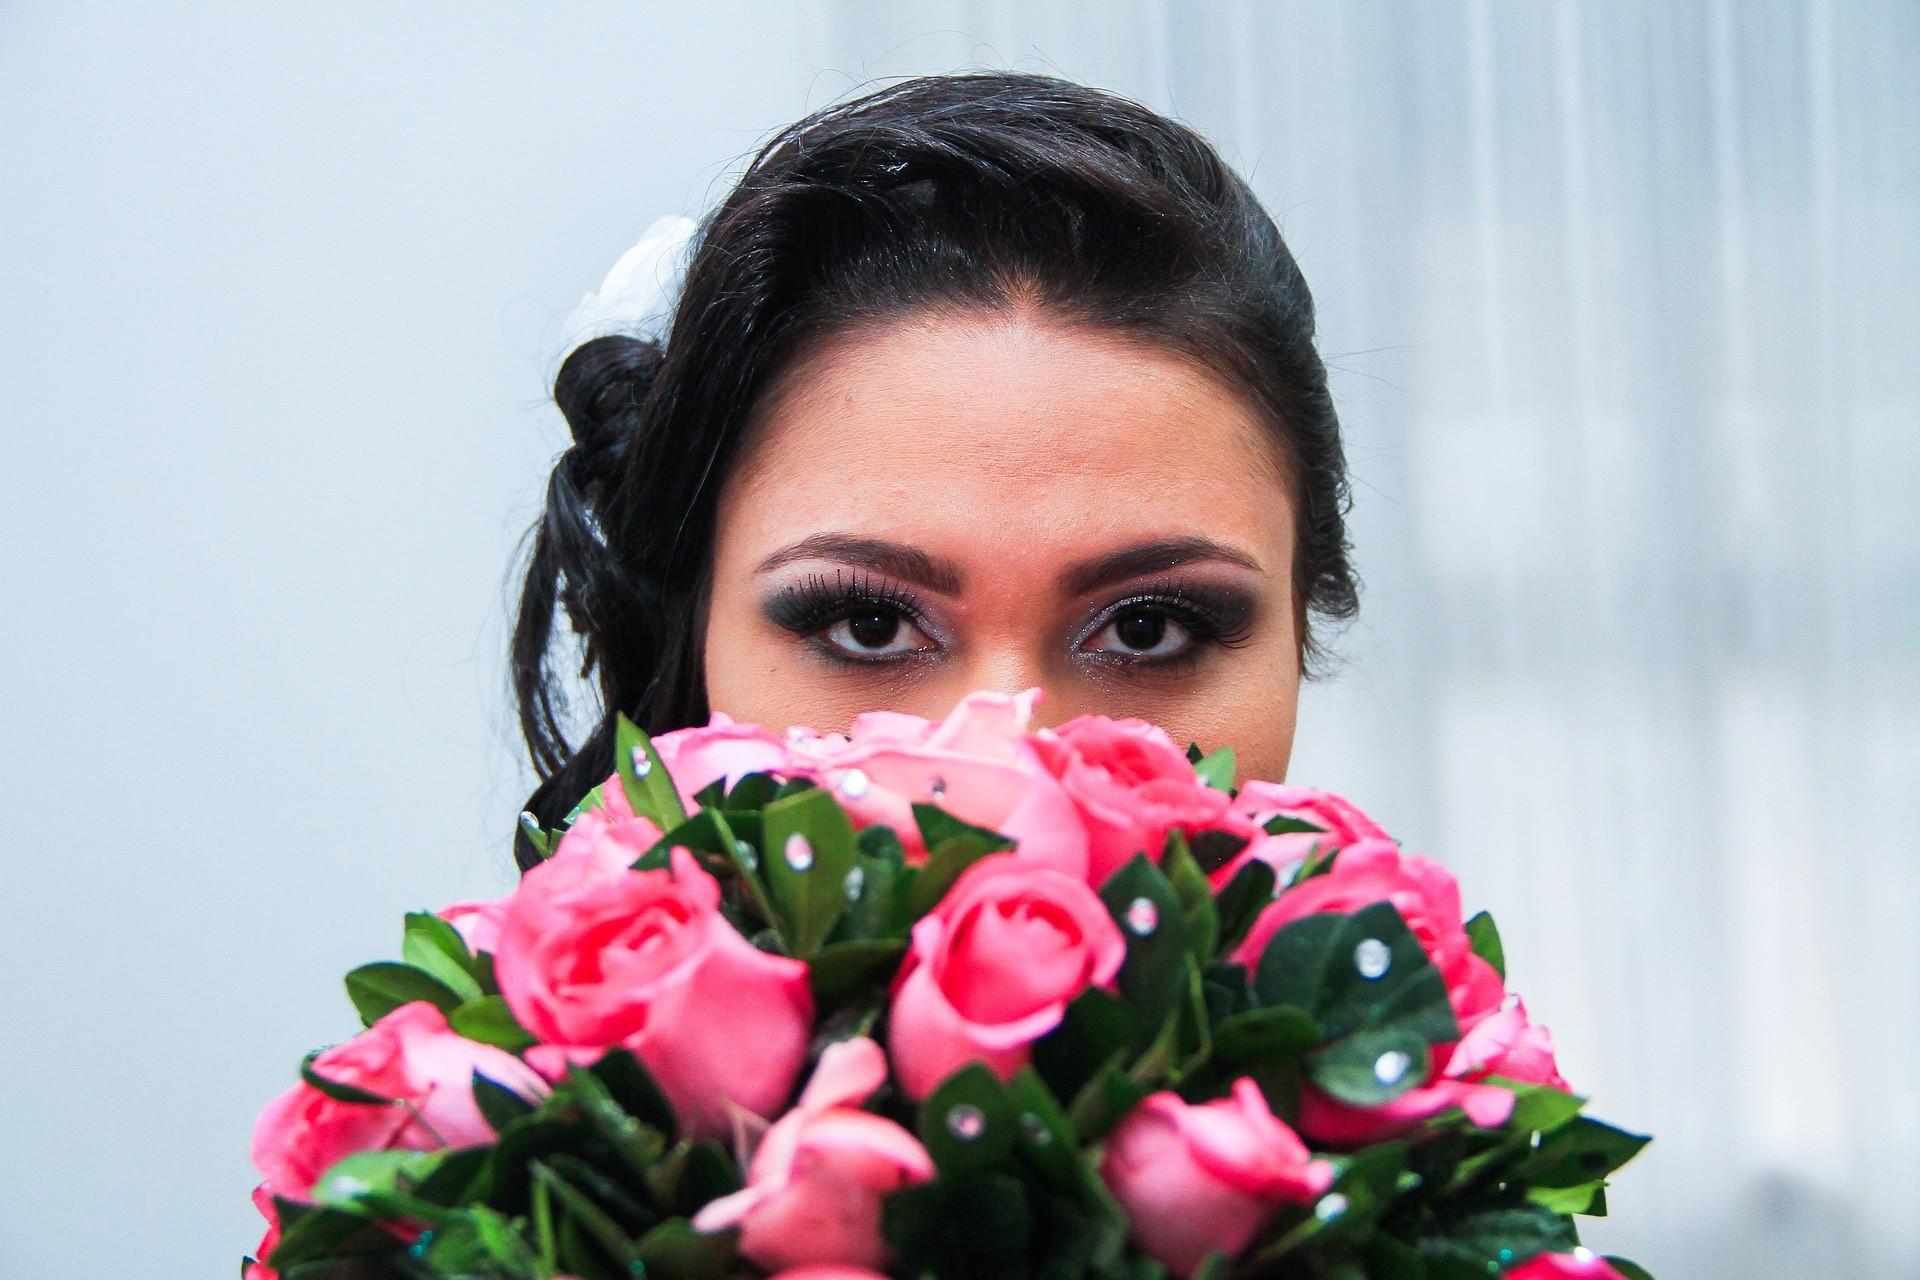 Novedades sobre moda para bodas, tendencias para novias y madrinas